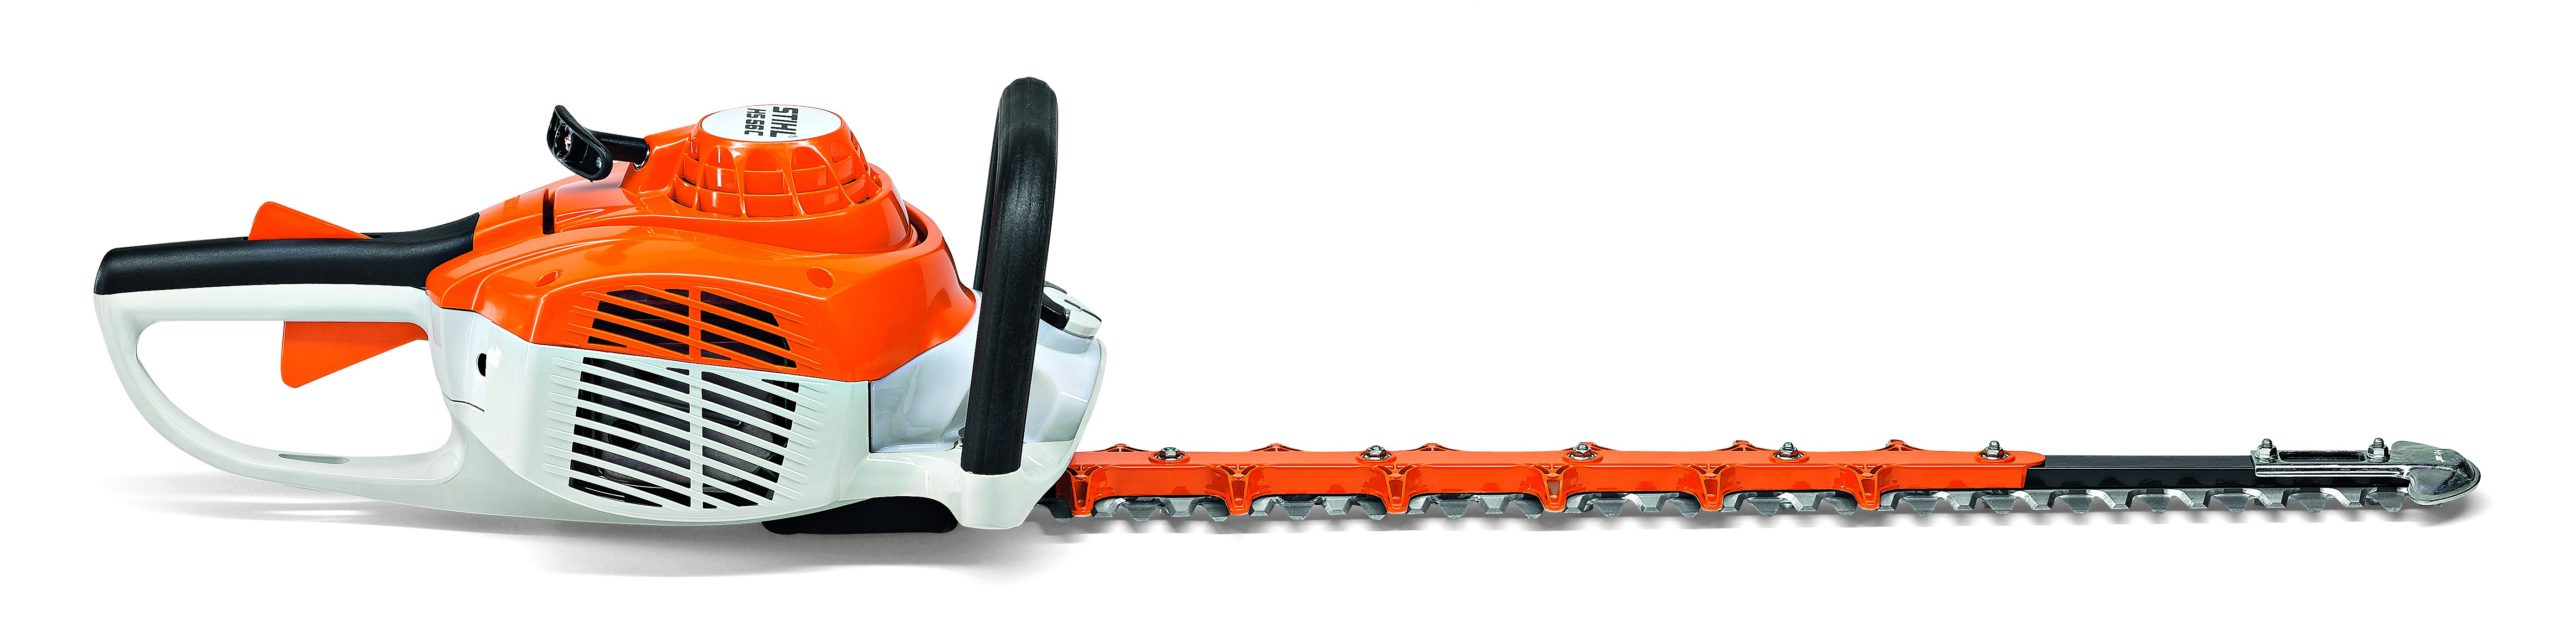 Stihl HS56 C-E Hedge trimmer